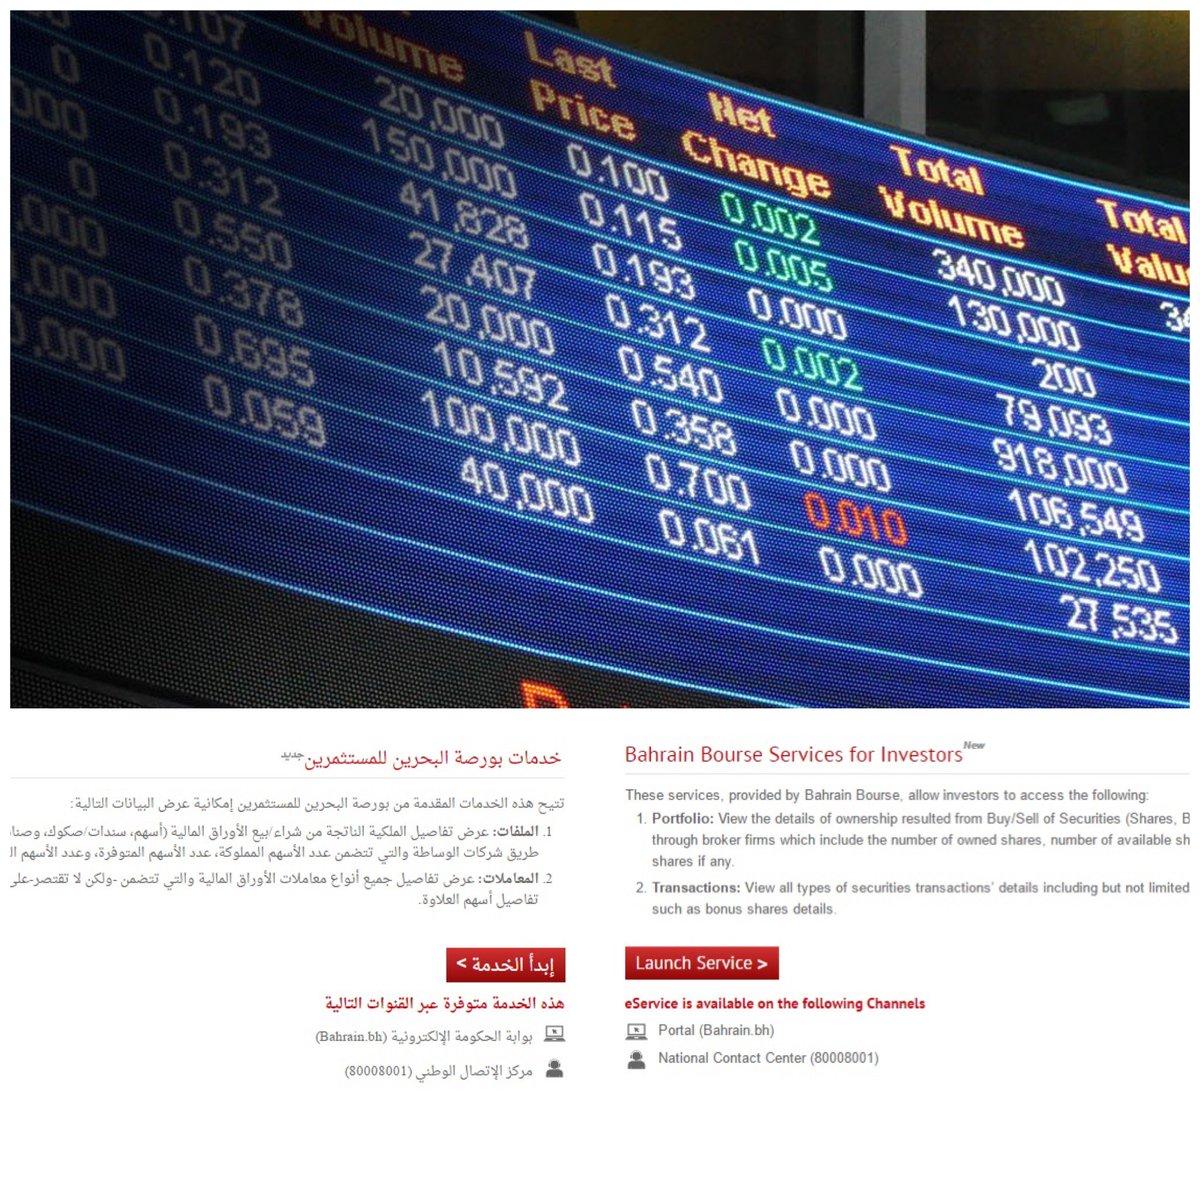 Iga Bahrain On Twitter اطلع على تفاصيل جميع أنواع الأوراق المالية